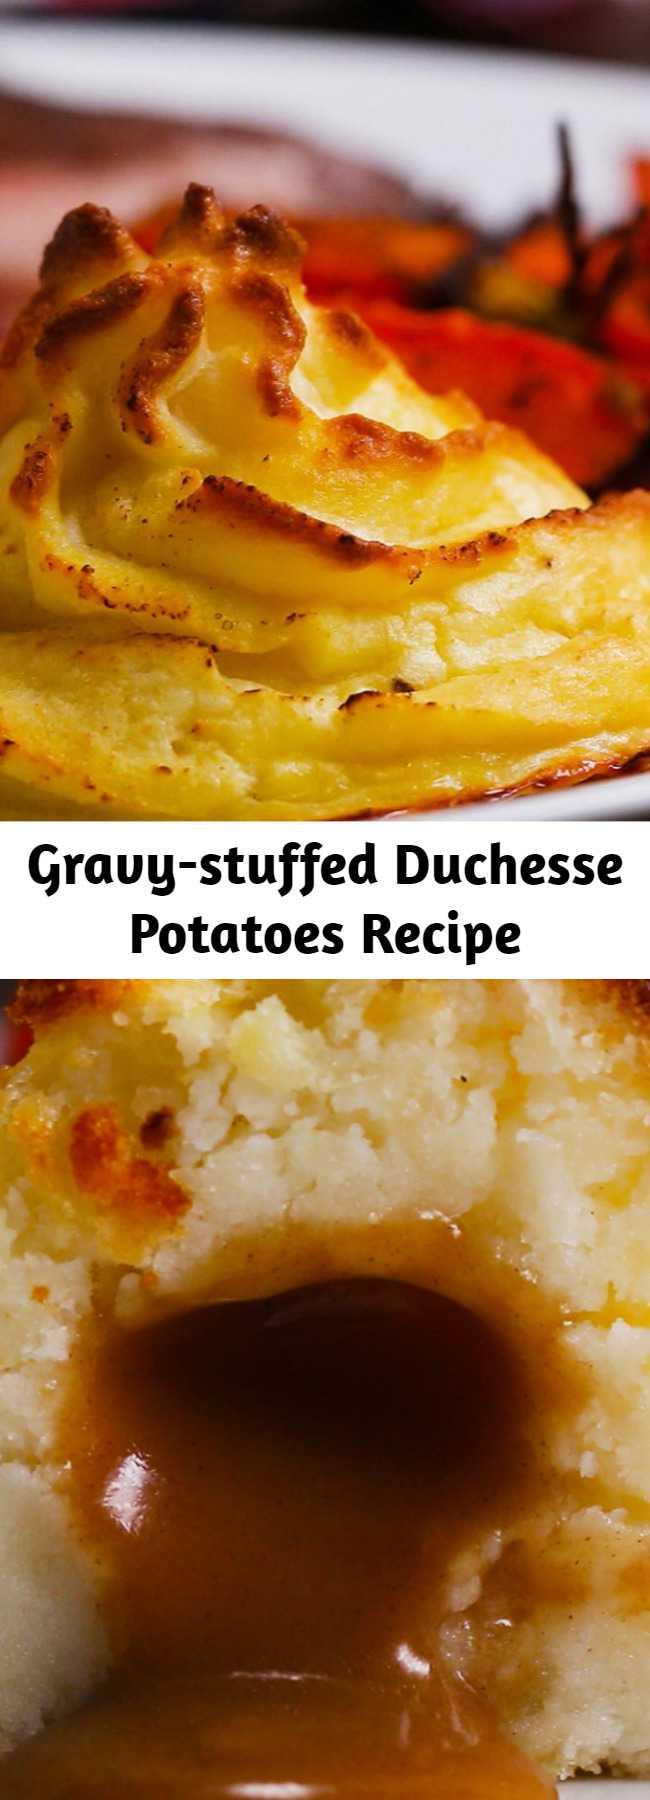 Gravy-stuffed Duchesse Potatoes Recipe